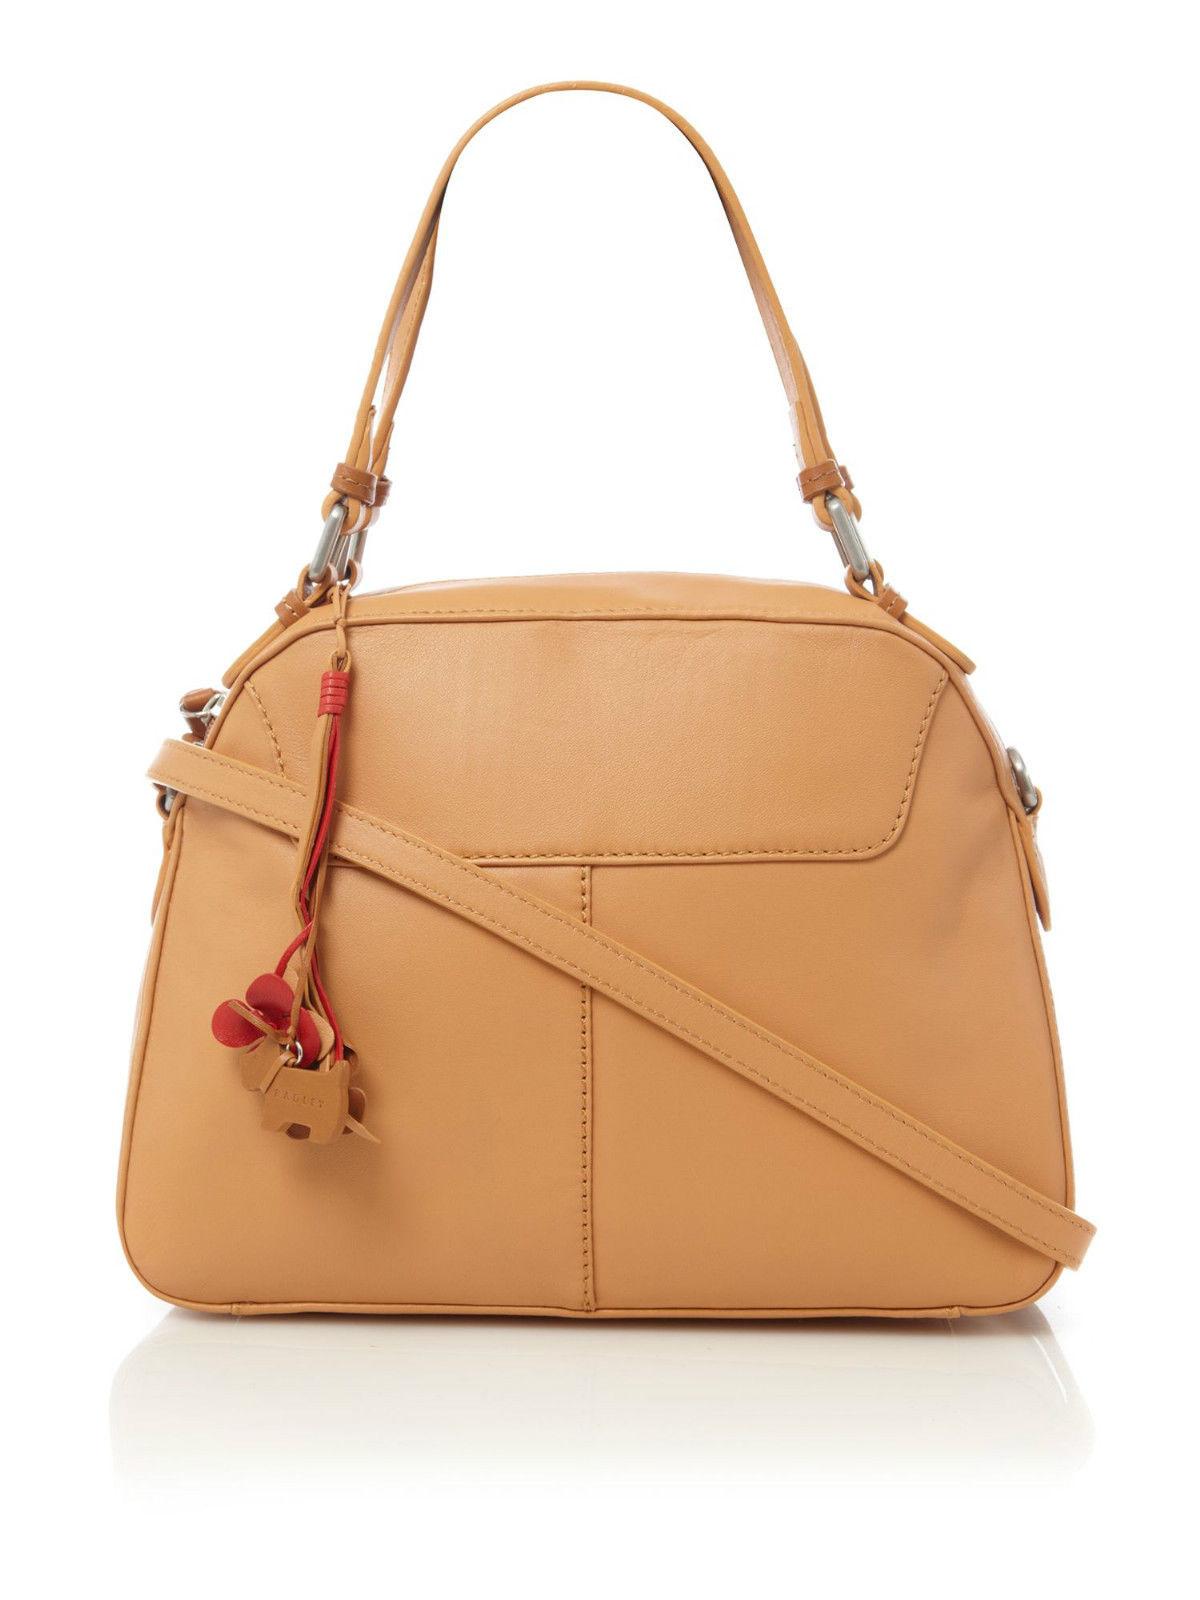 radley handbags wholesale high quality wholesale handbags wholesale camo handbags